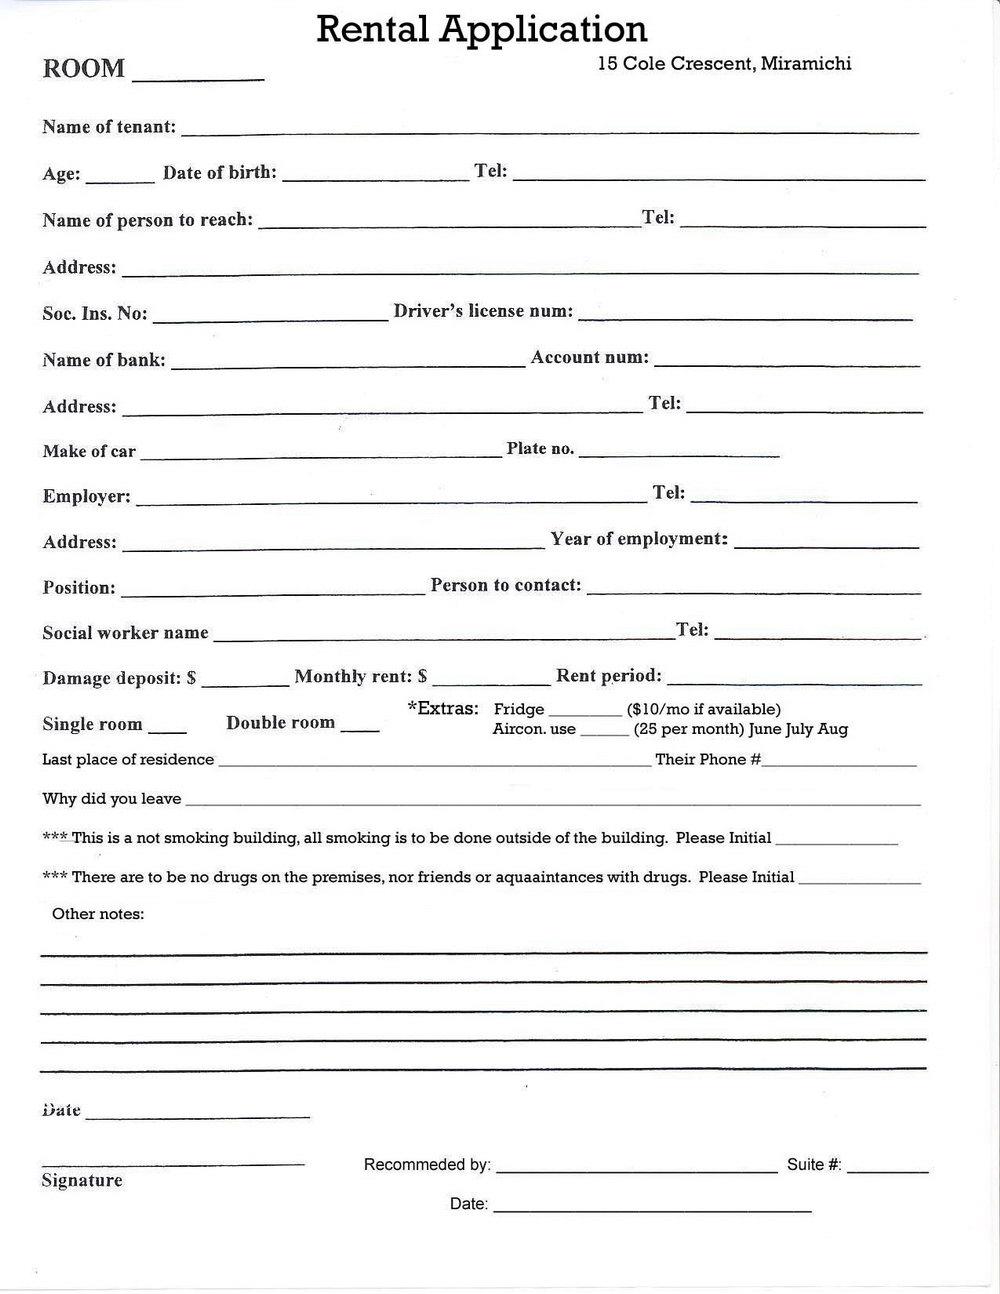 Oregon Rental Application Form Free